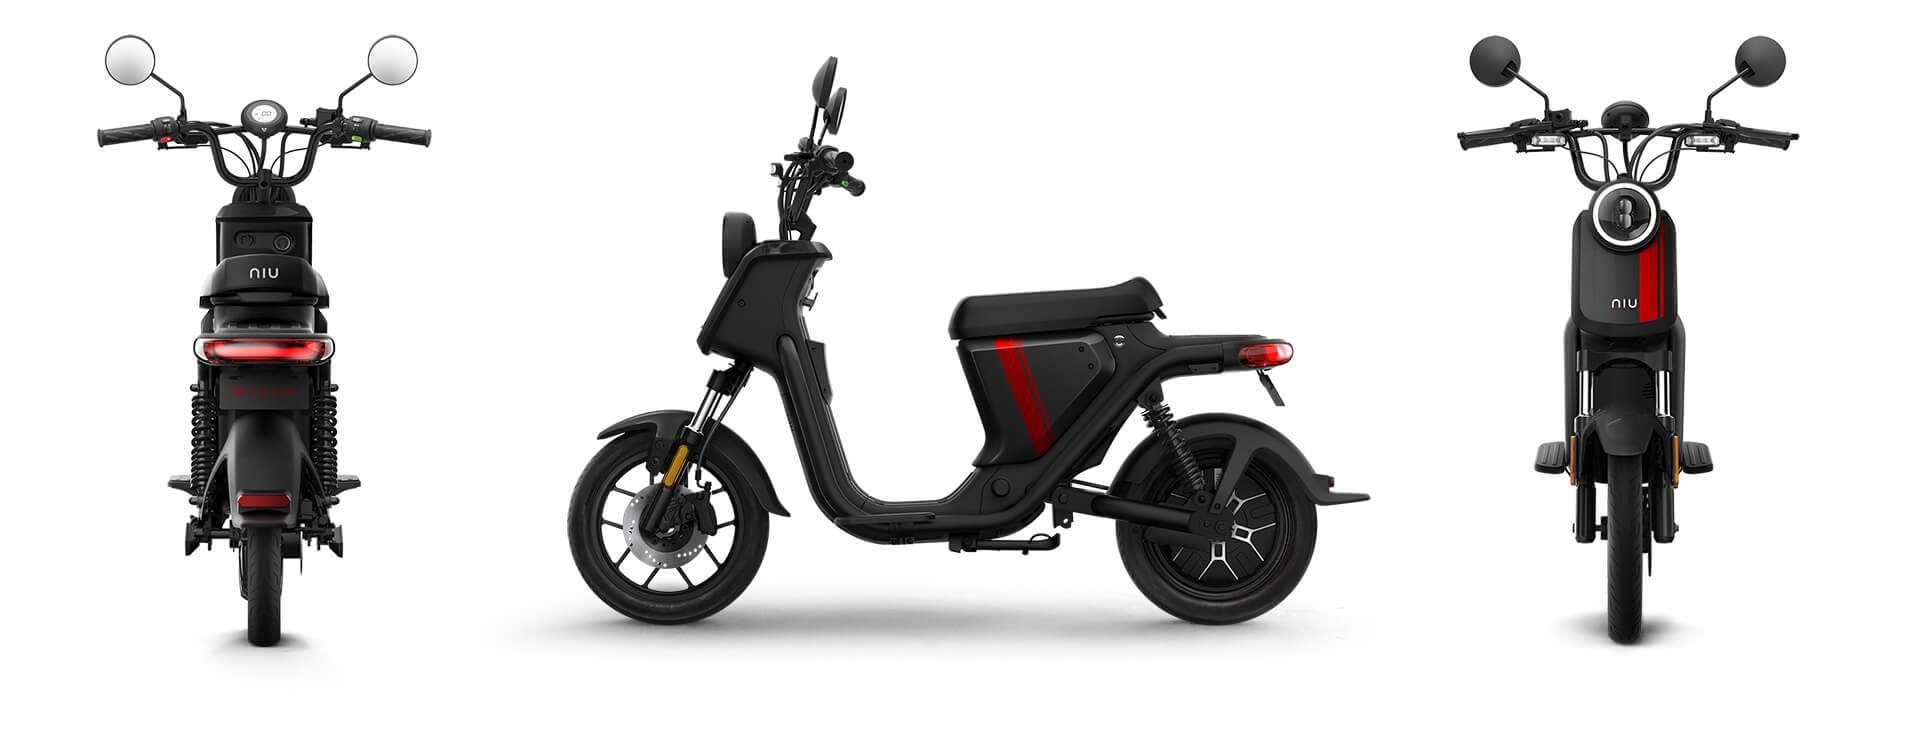 niu_uqi_pro_elektricni_moped_crno-rdec